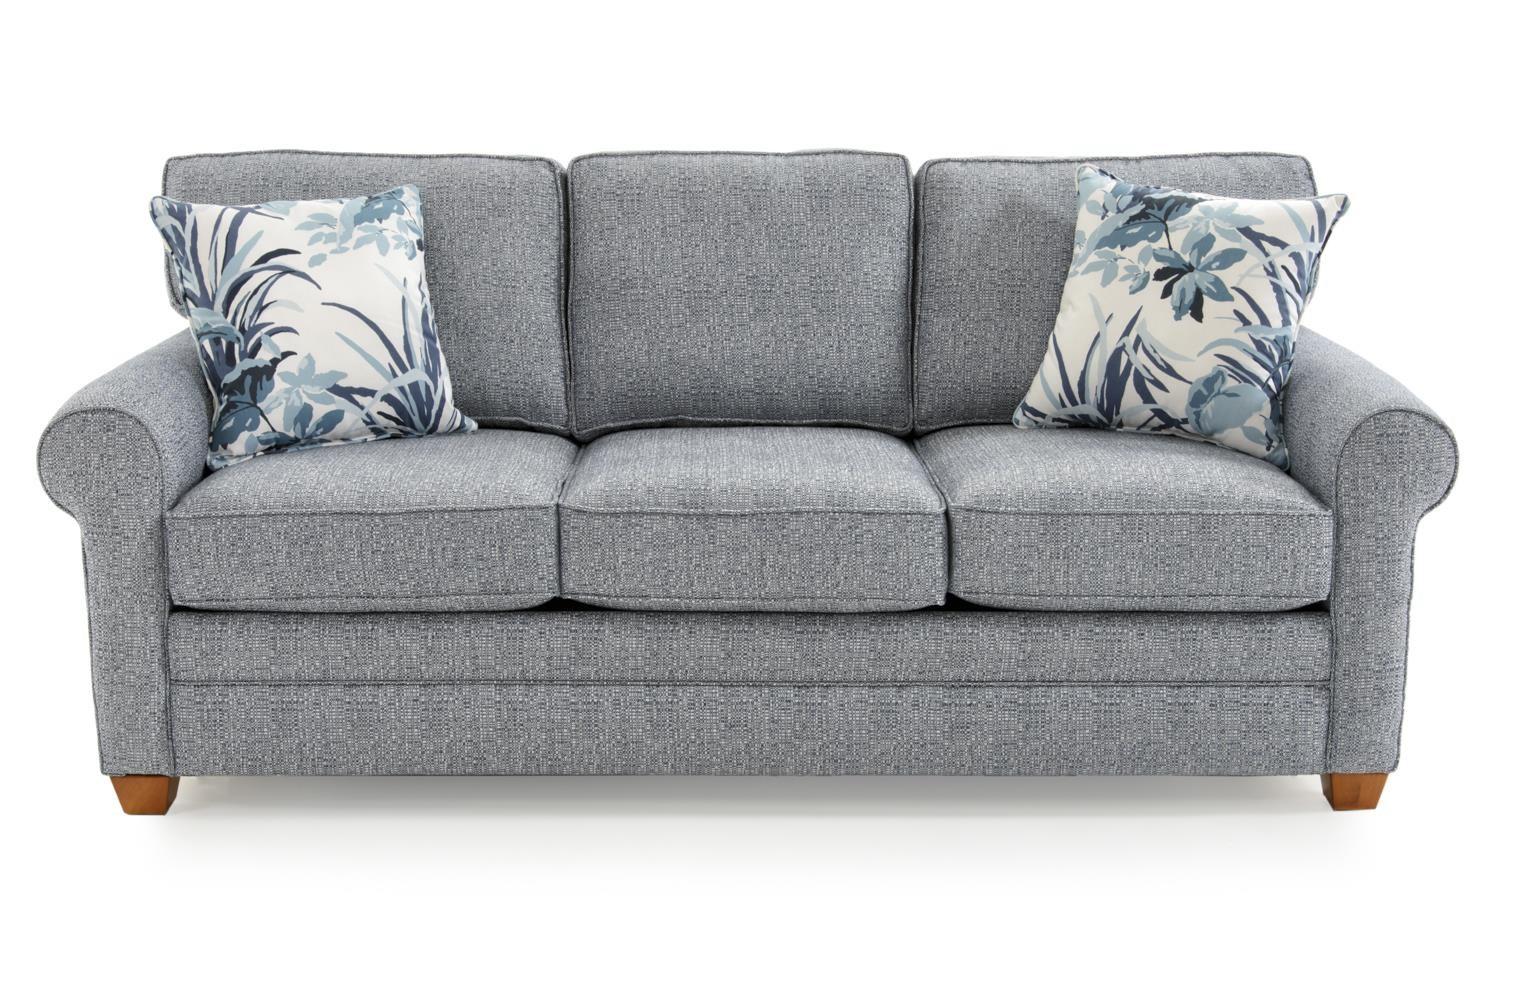 Capris Furniture 402 Q402 Allox Ocean Casual Rolled Arm